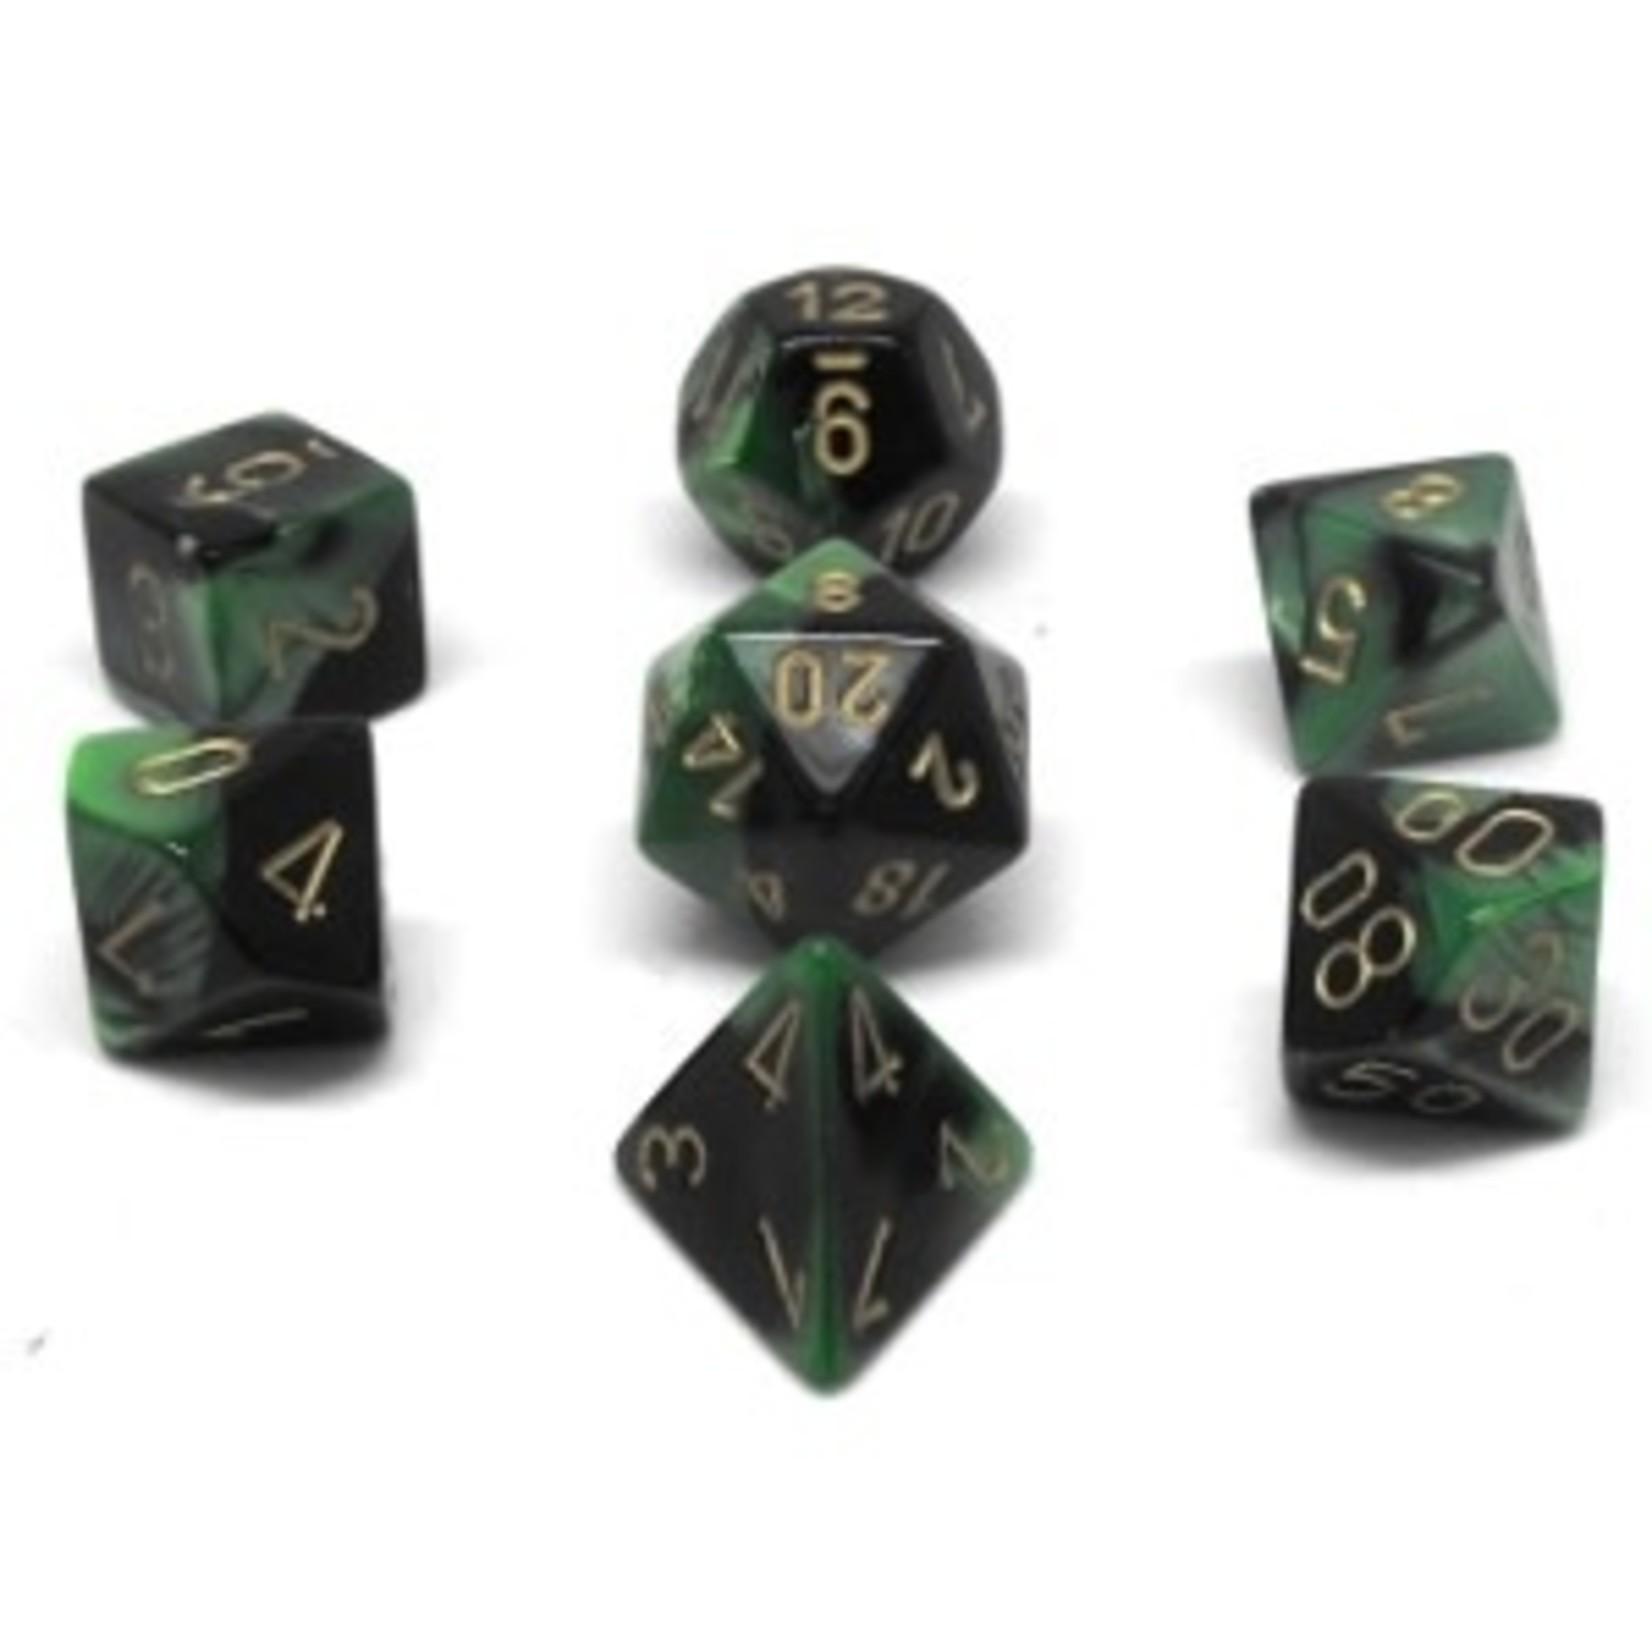 Chessex Set 7D Poly Gemini Black-Green/Gold